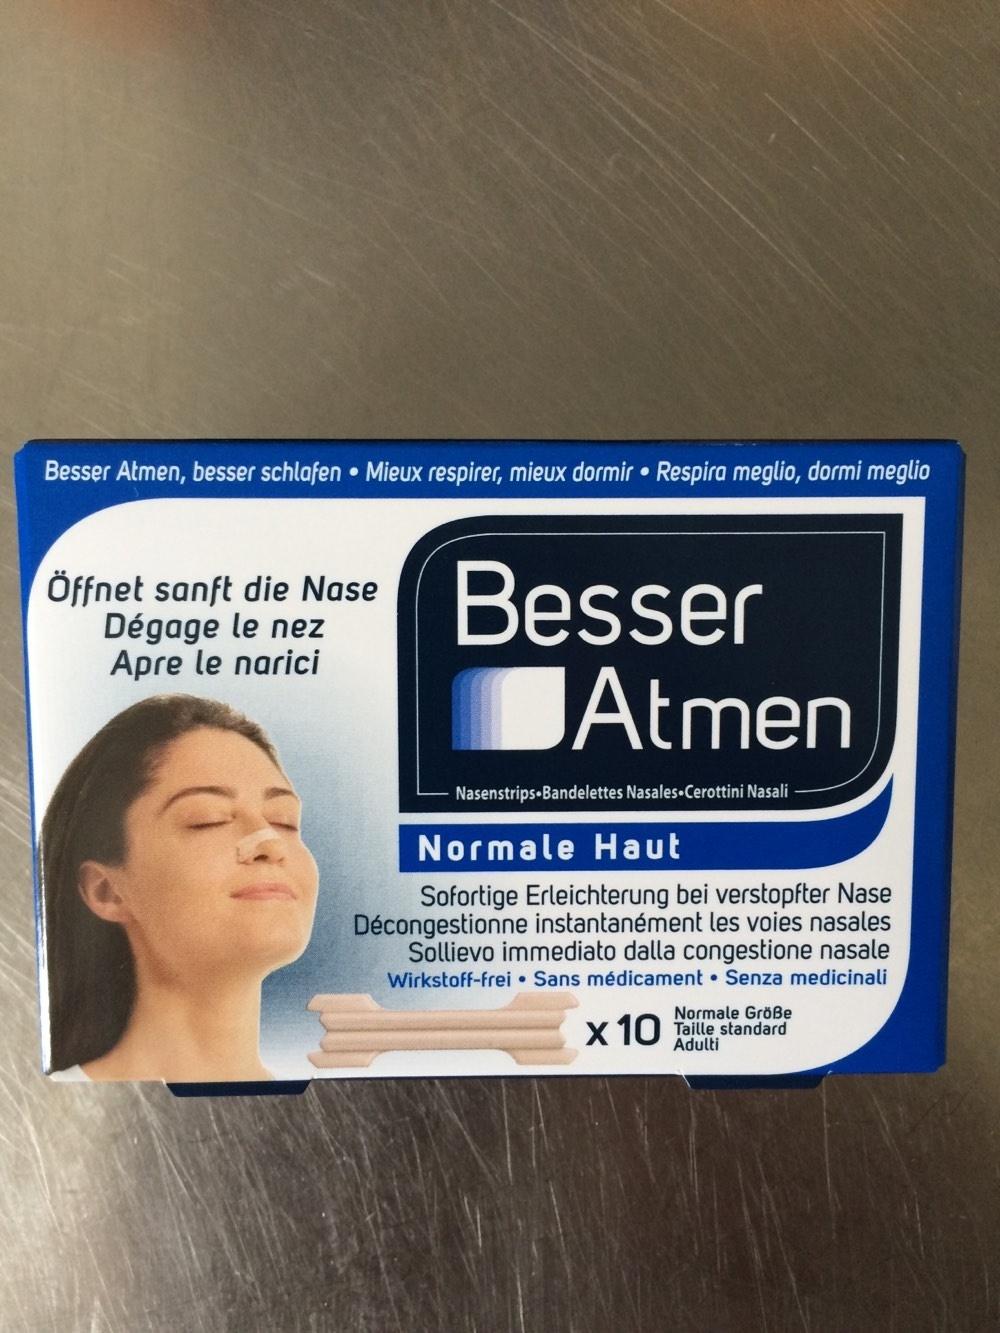 Besser Atmen Normal - Product